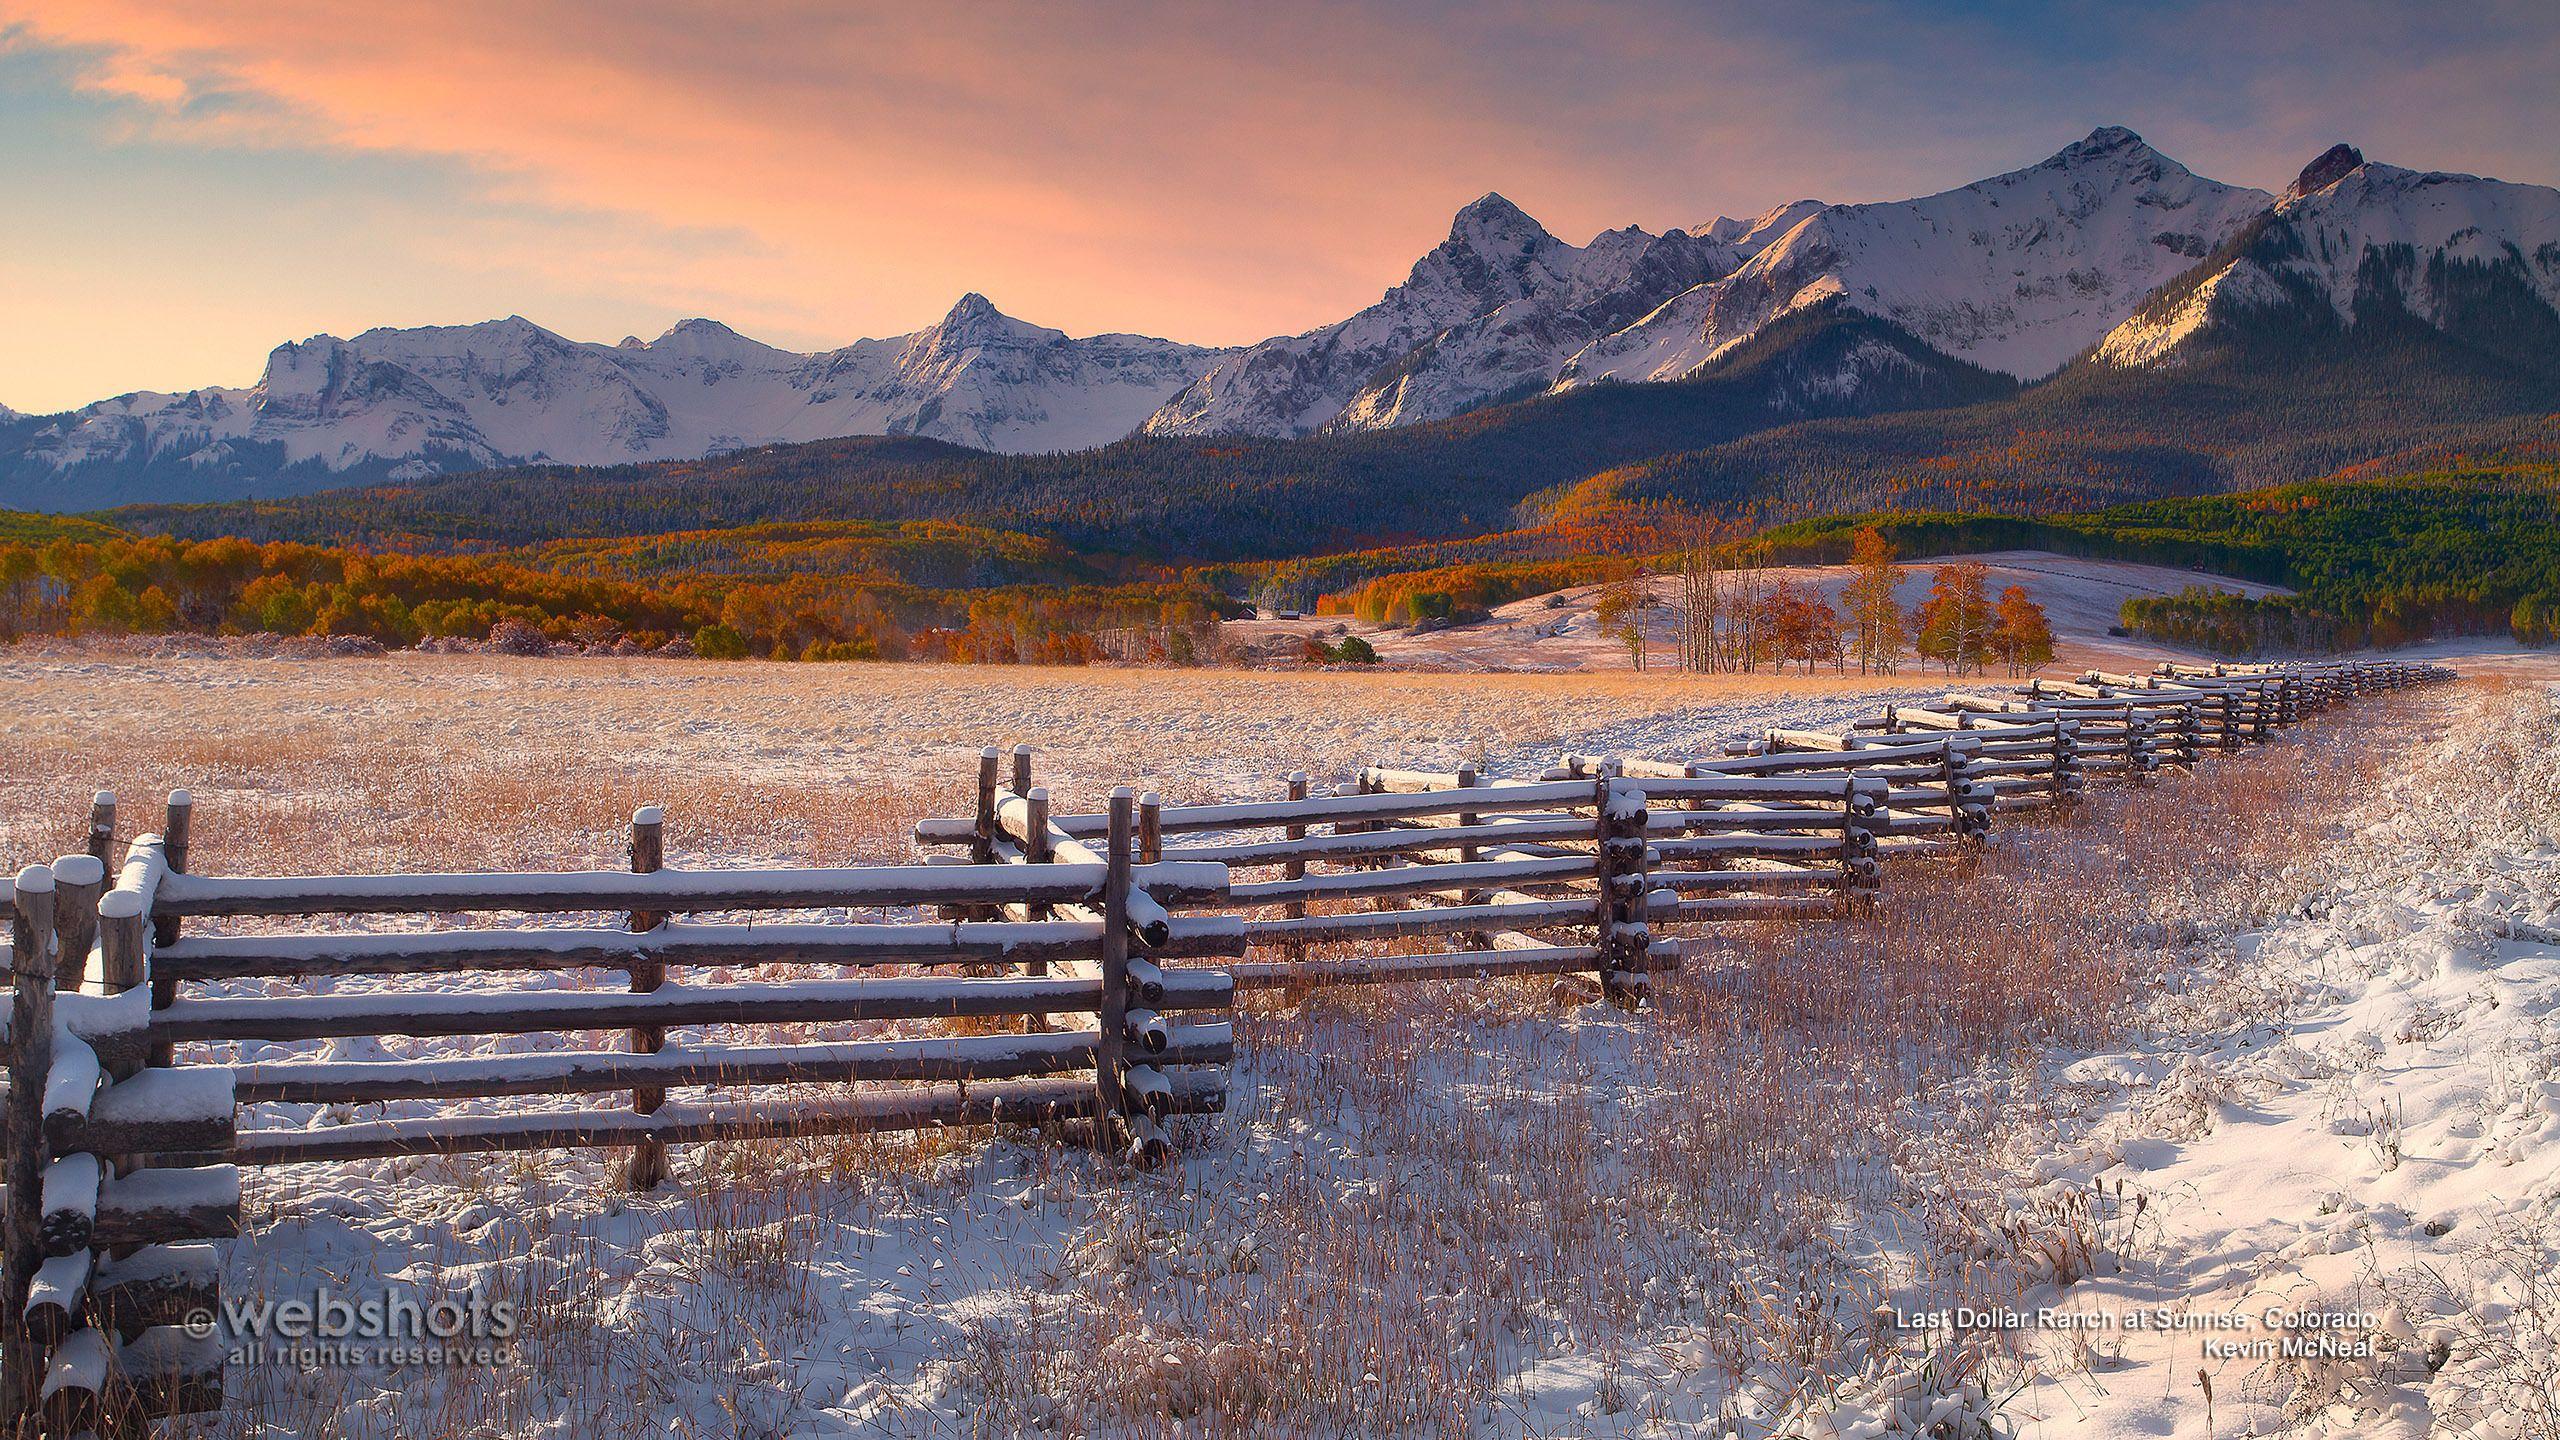 Today's Wallpaper: Last Dollar Ranch at Sunrise, Colorado